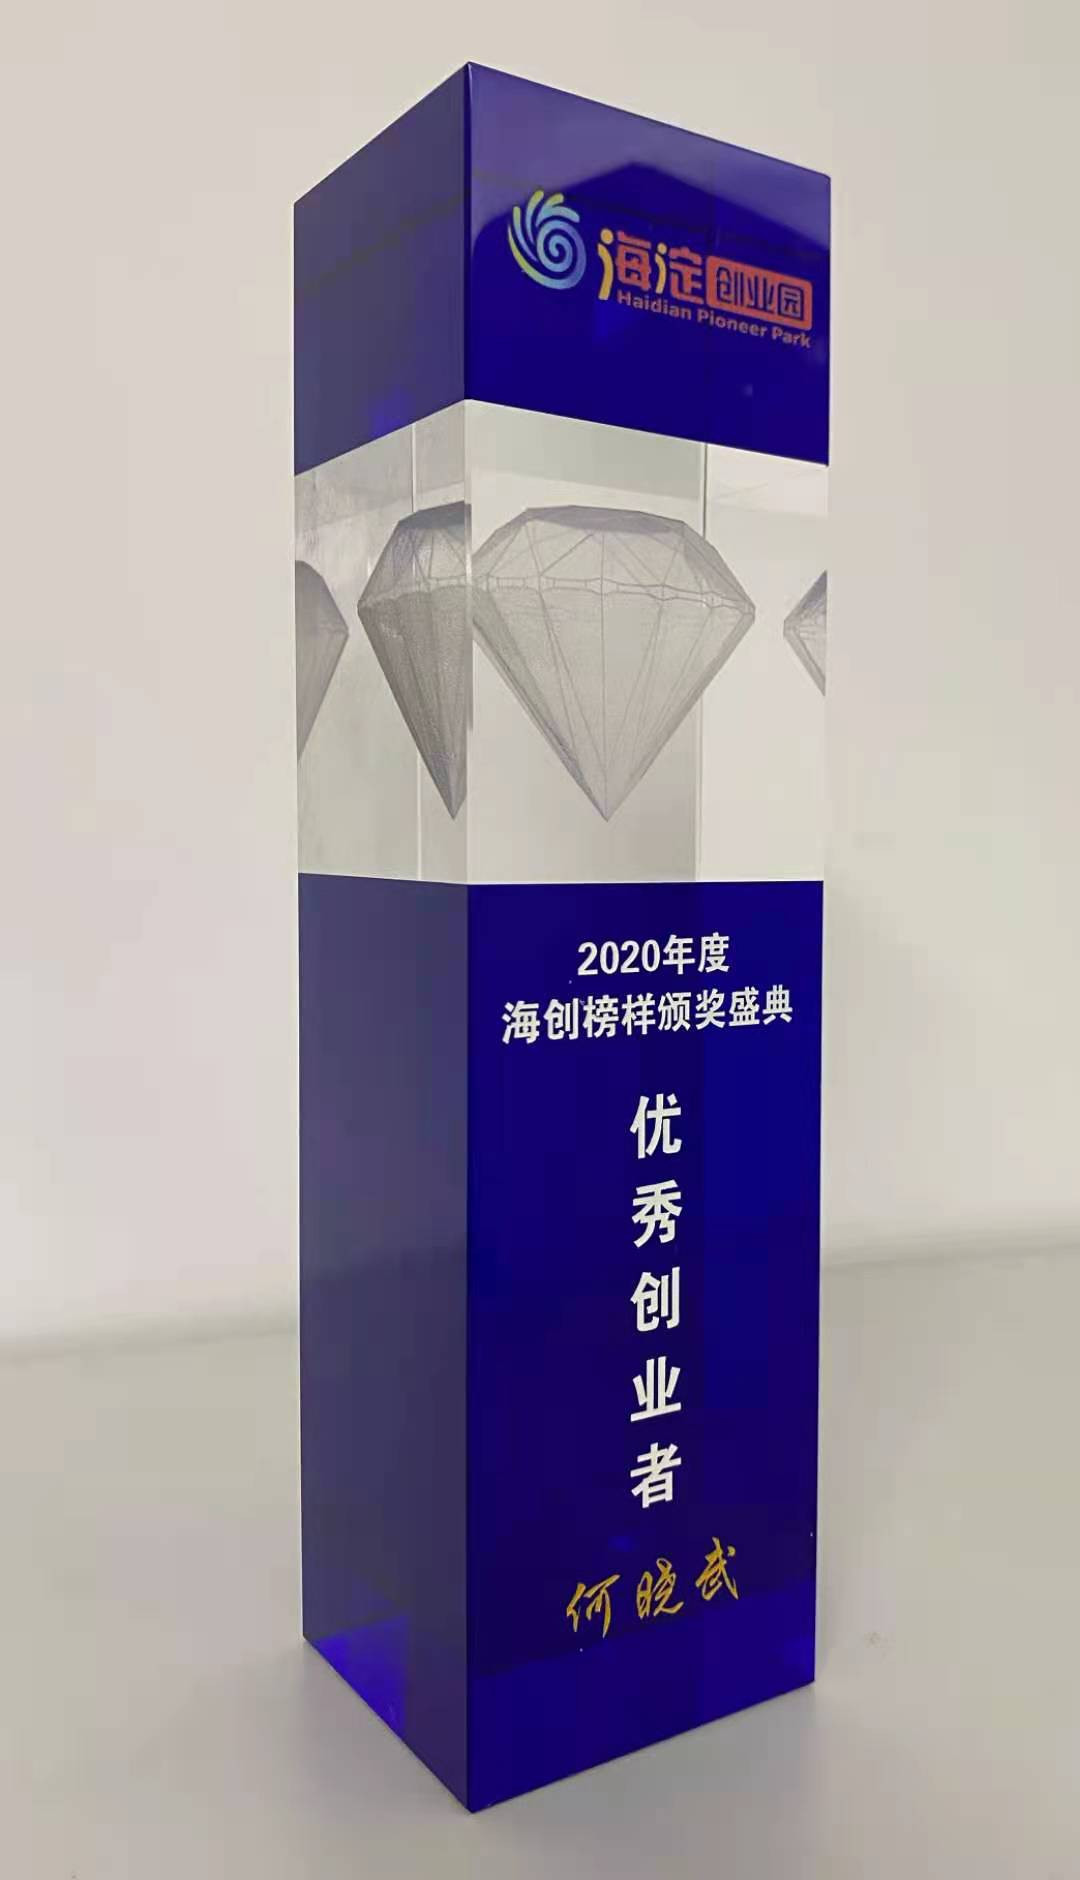 Excellent Entrepreneur of Haichuang Model 2020